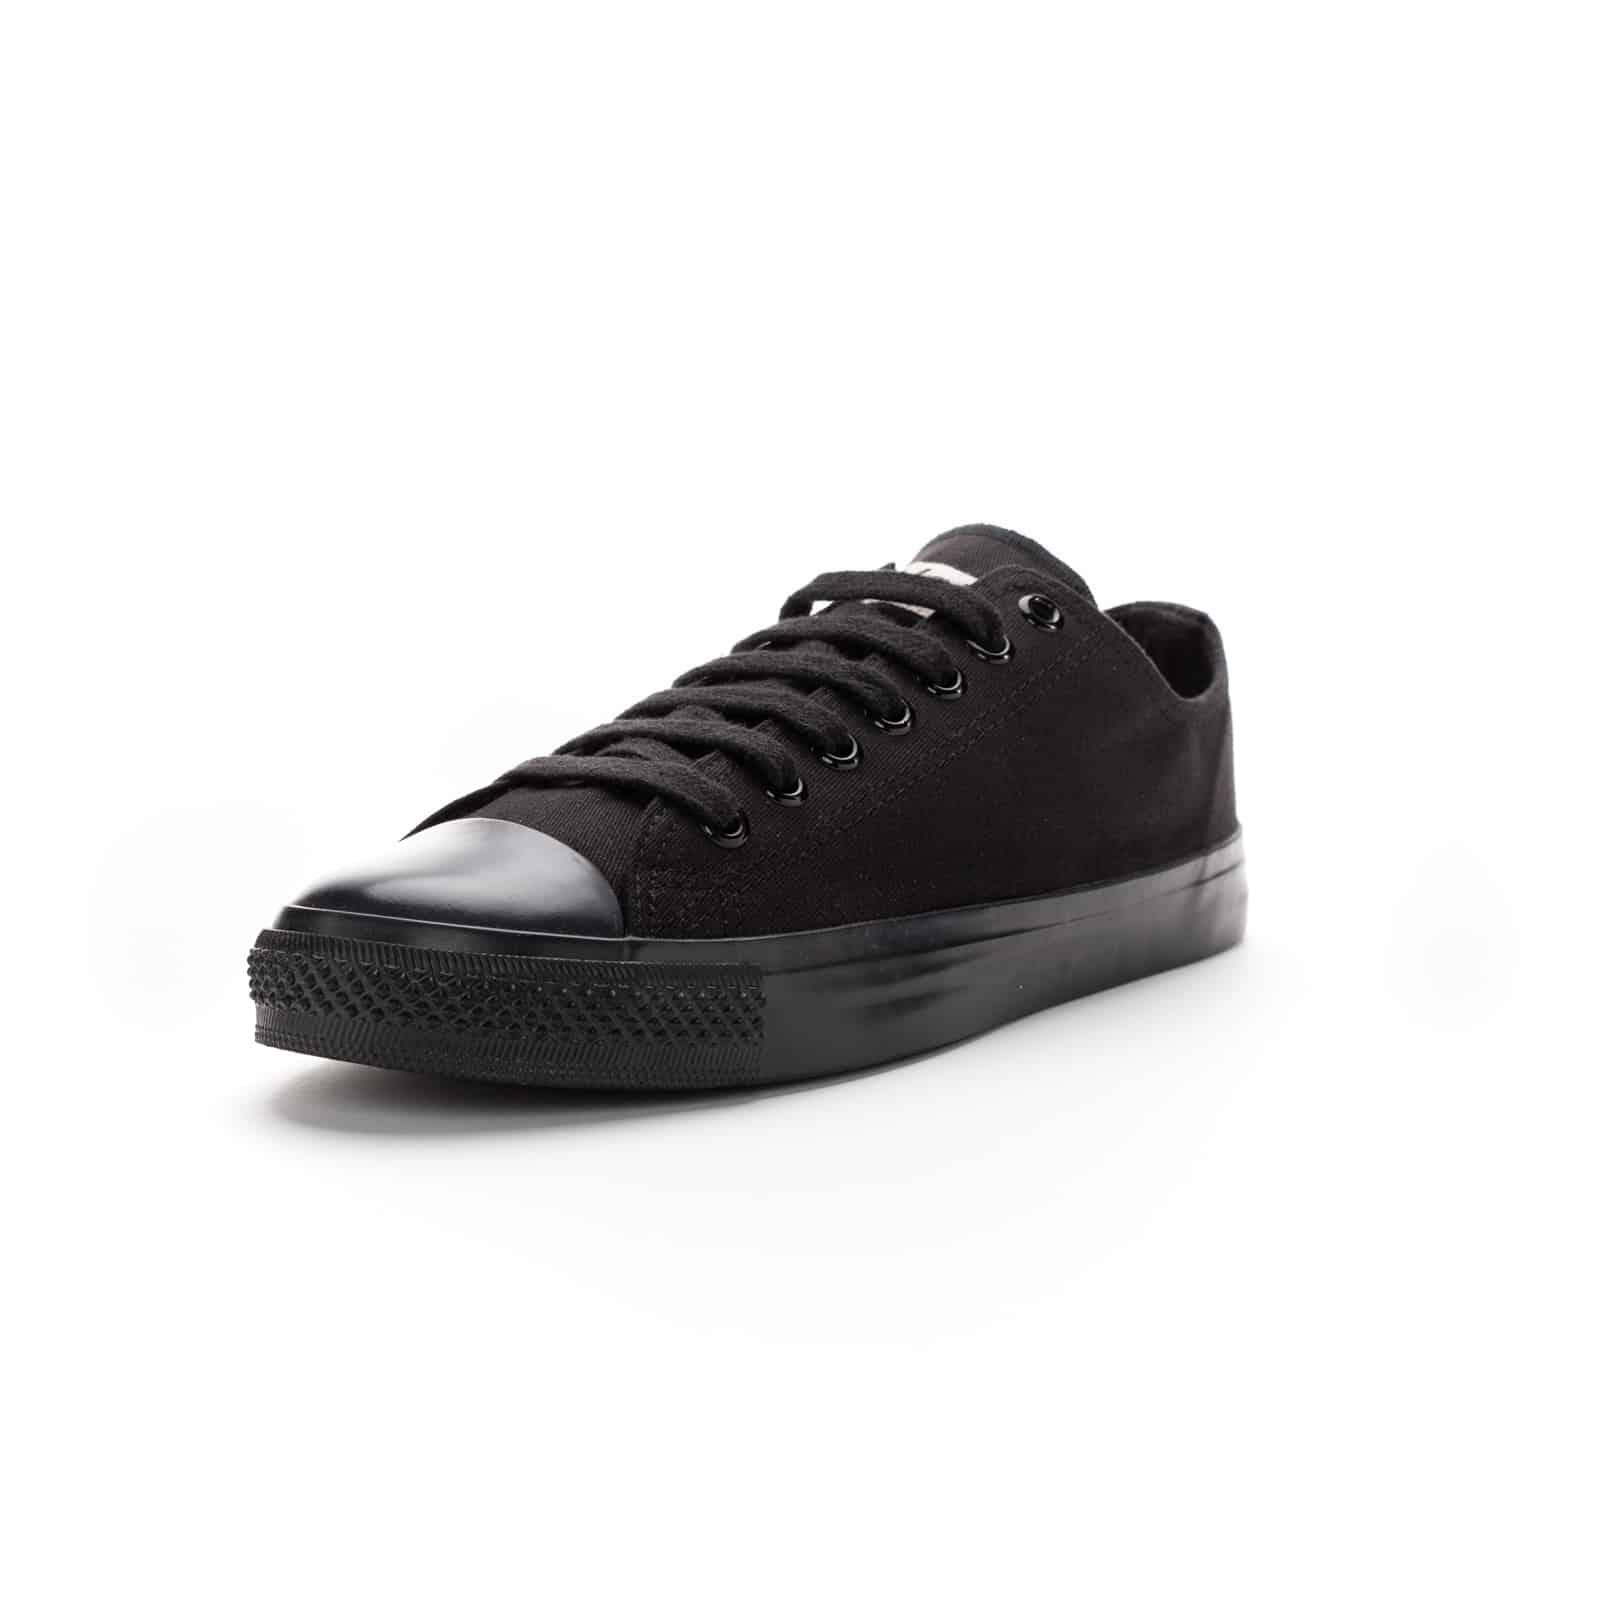 Faire Sneaker Schwarz | Black Cap Lo Cut